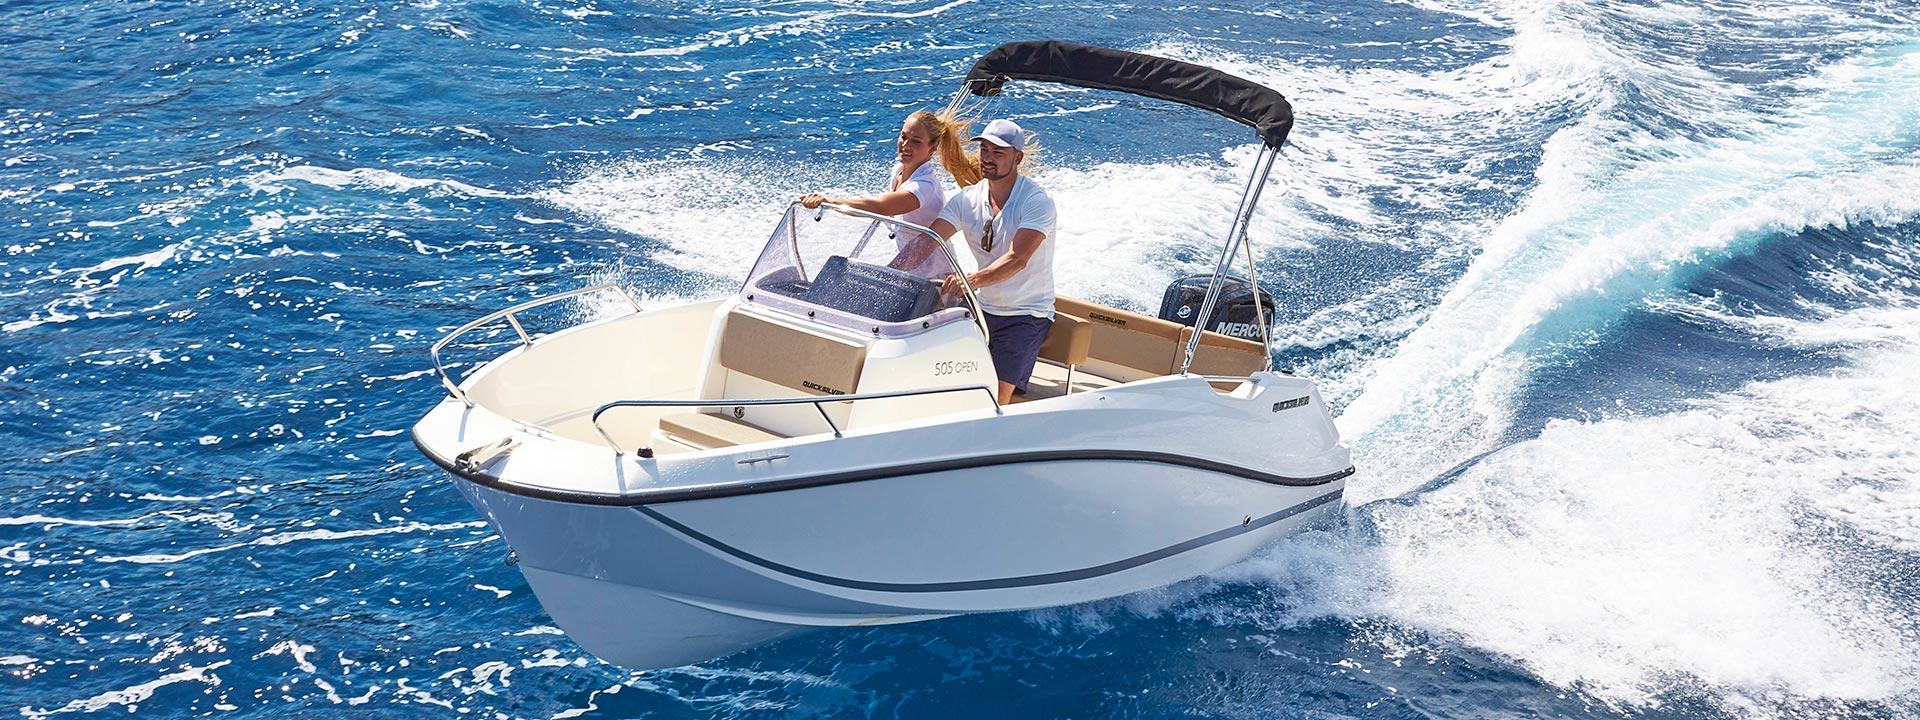 mayer-charter-boat-header-quicksilver-activ-505-open-01